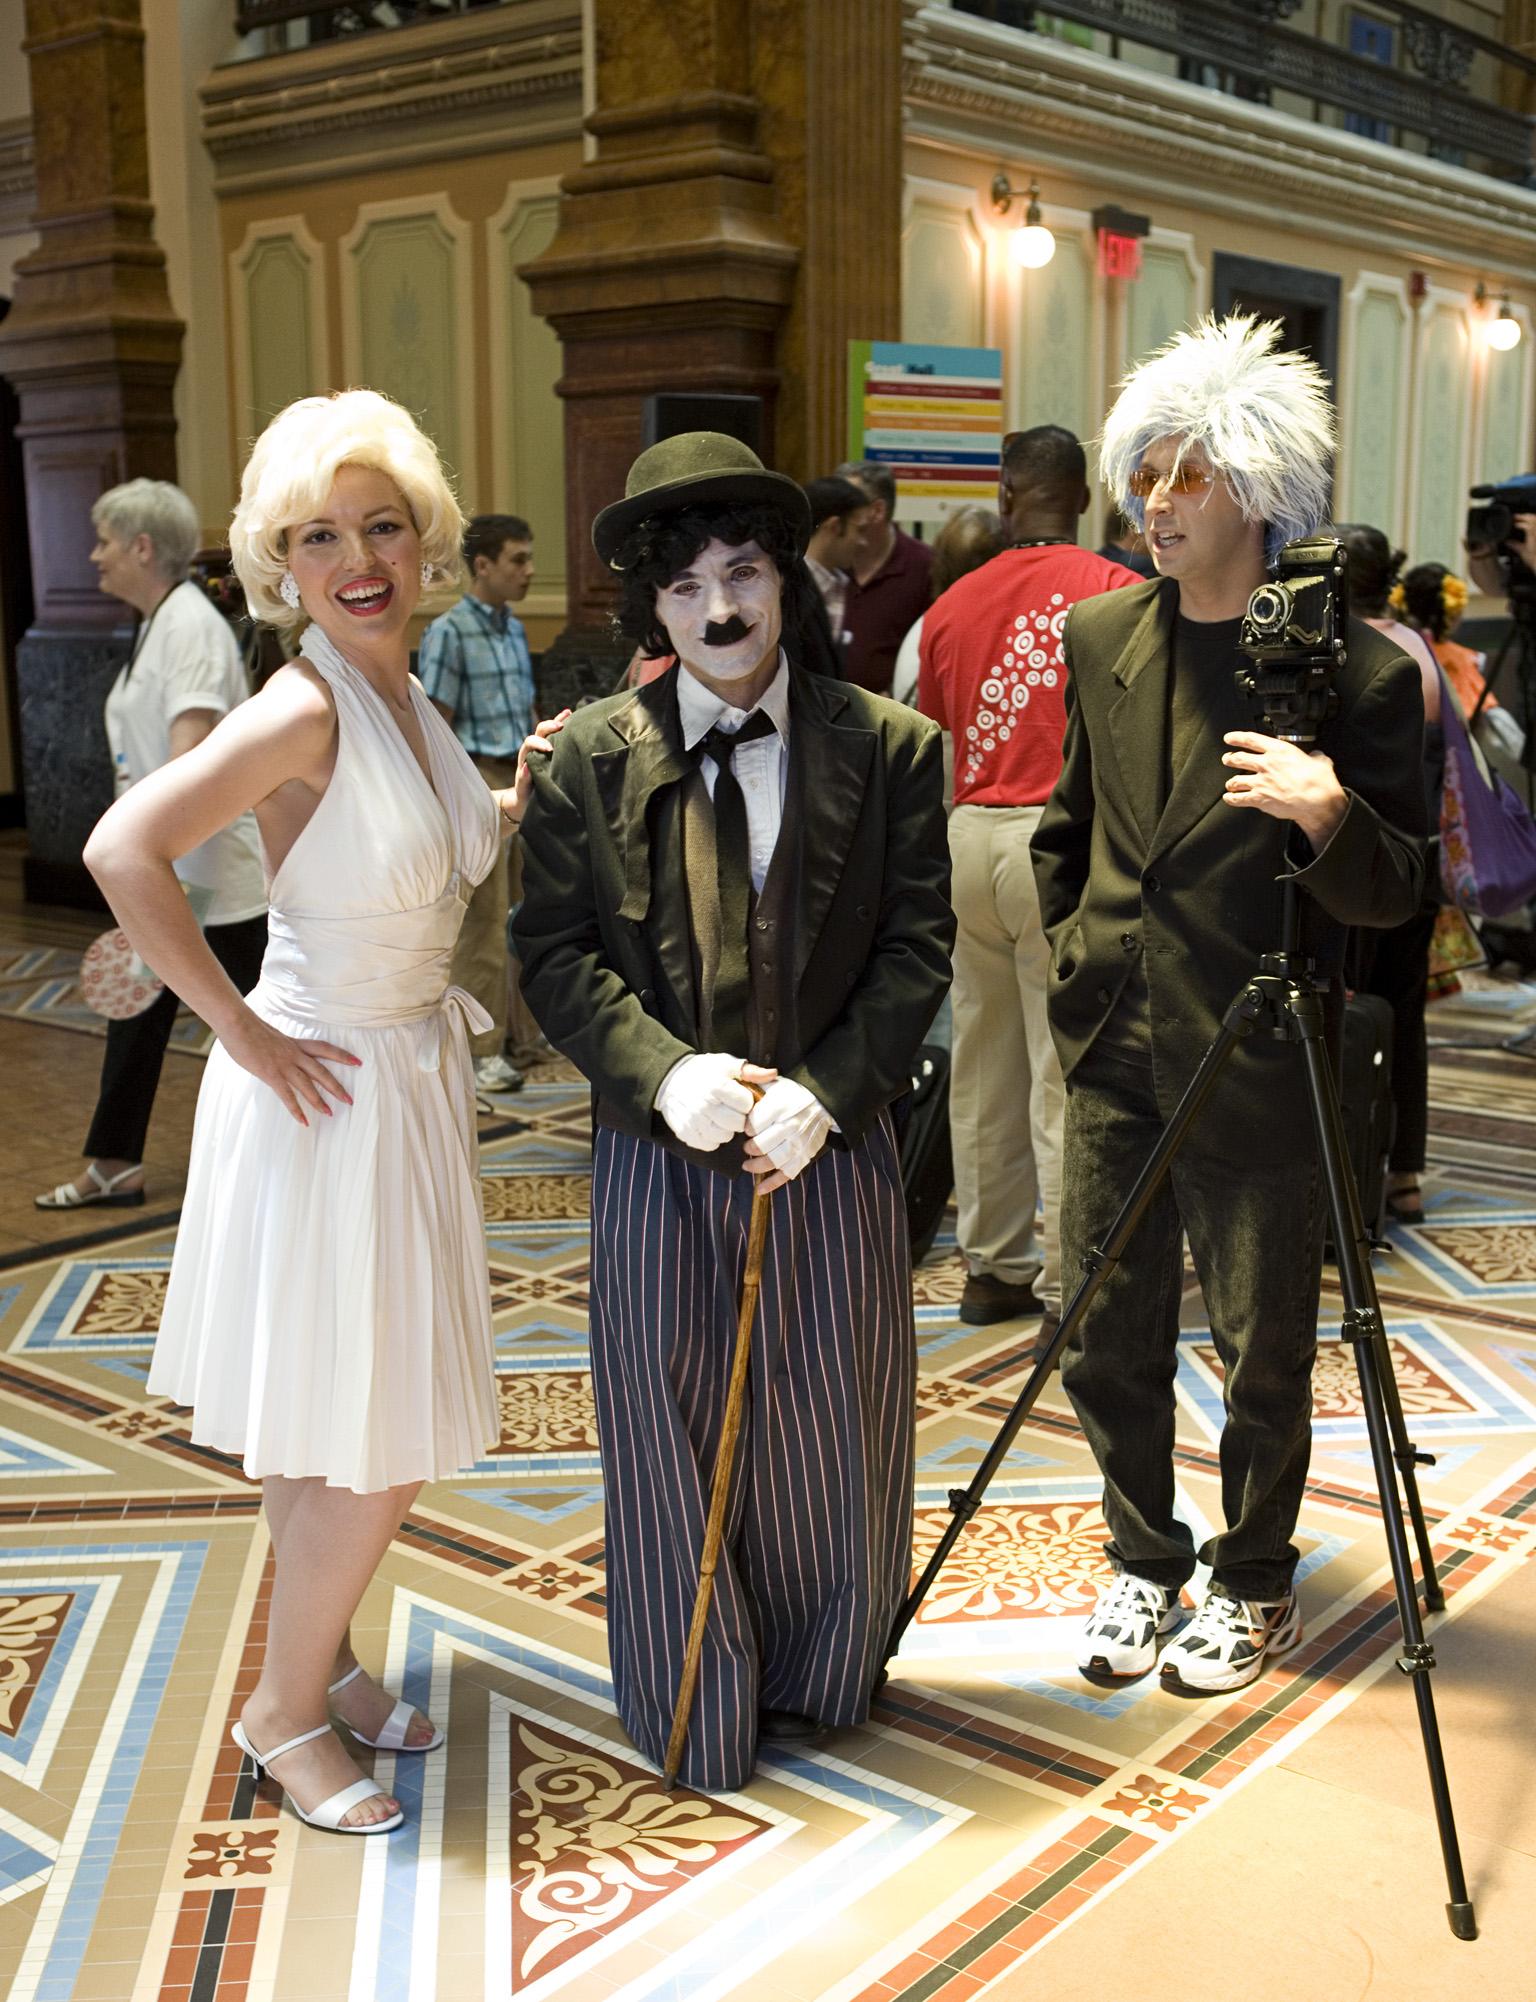 Three people dressed as Marilyn Monroe, left, Charlie Chaplin, and Andy Warhol